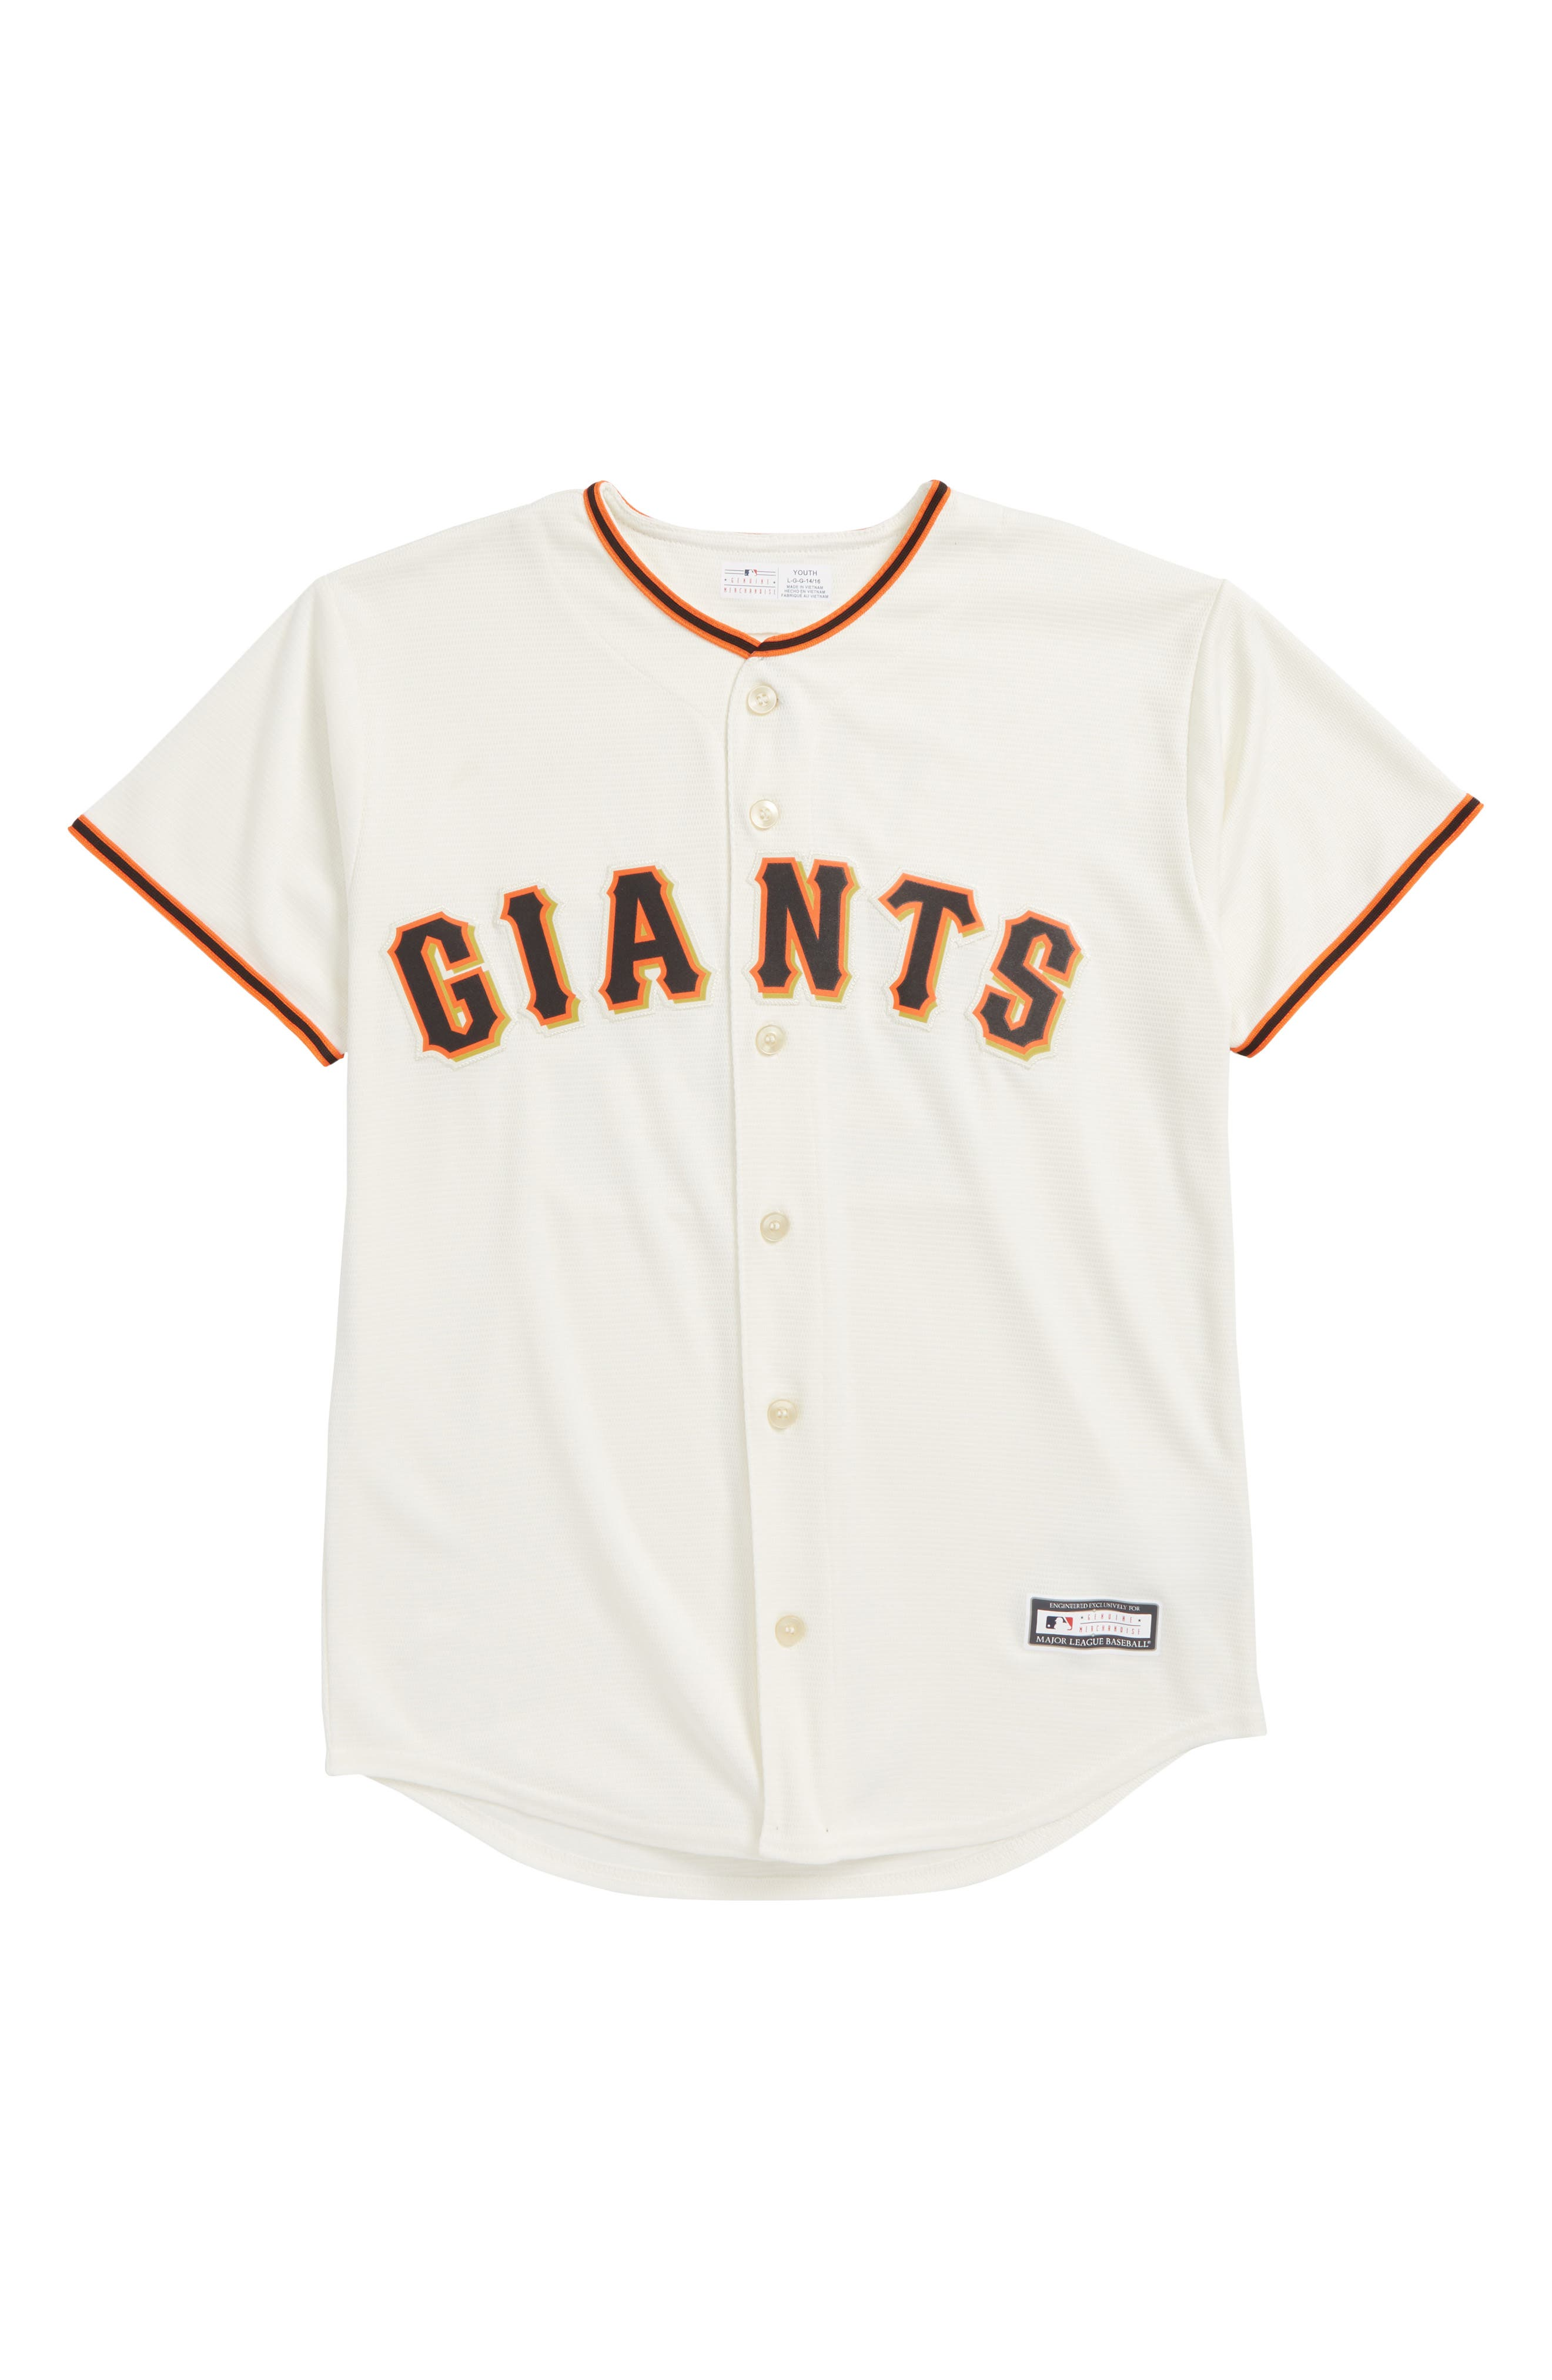 San Francisco Giants - Buster Posey Baseball Jersey,                         Main,                         color, 100